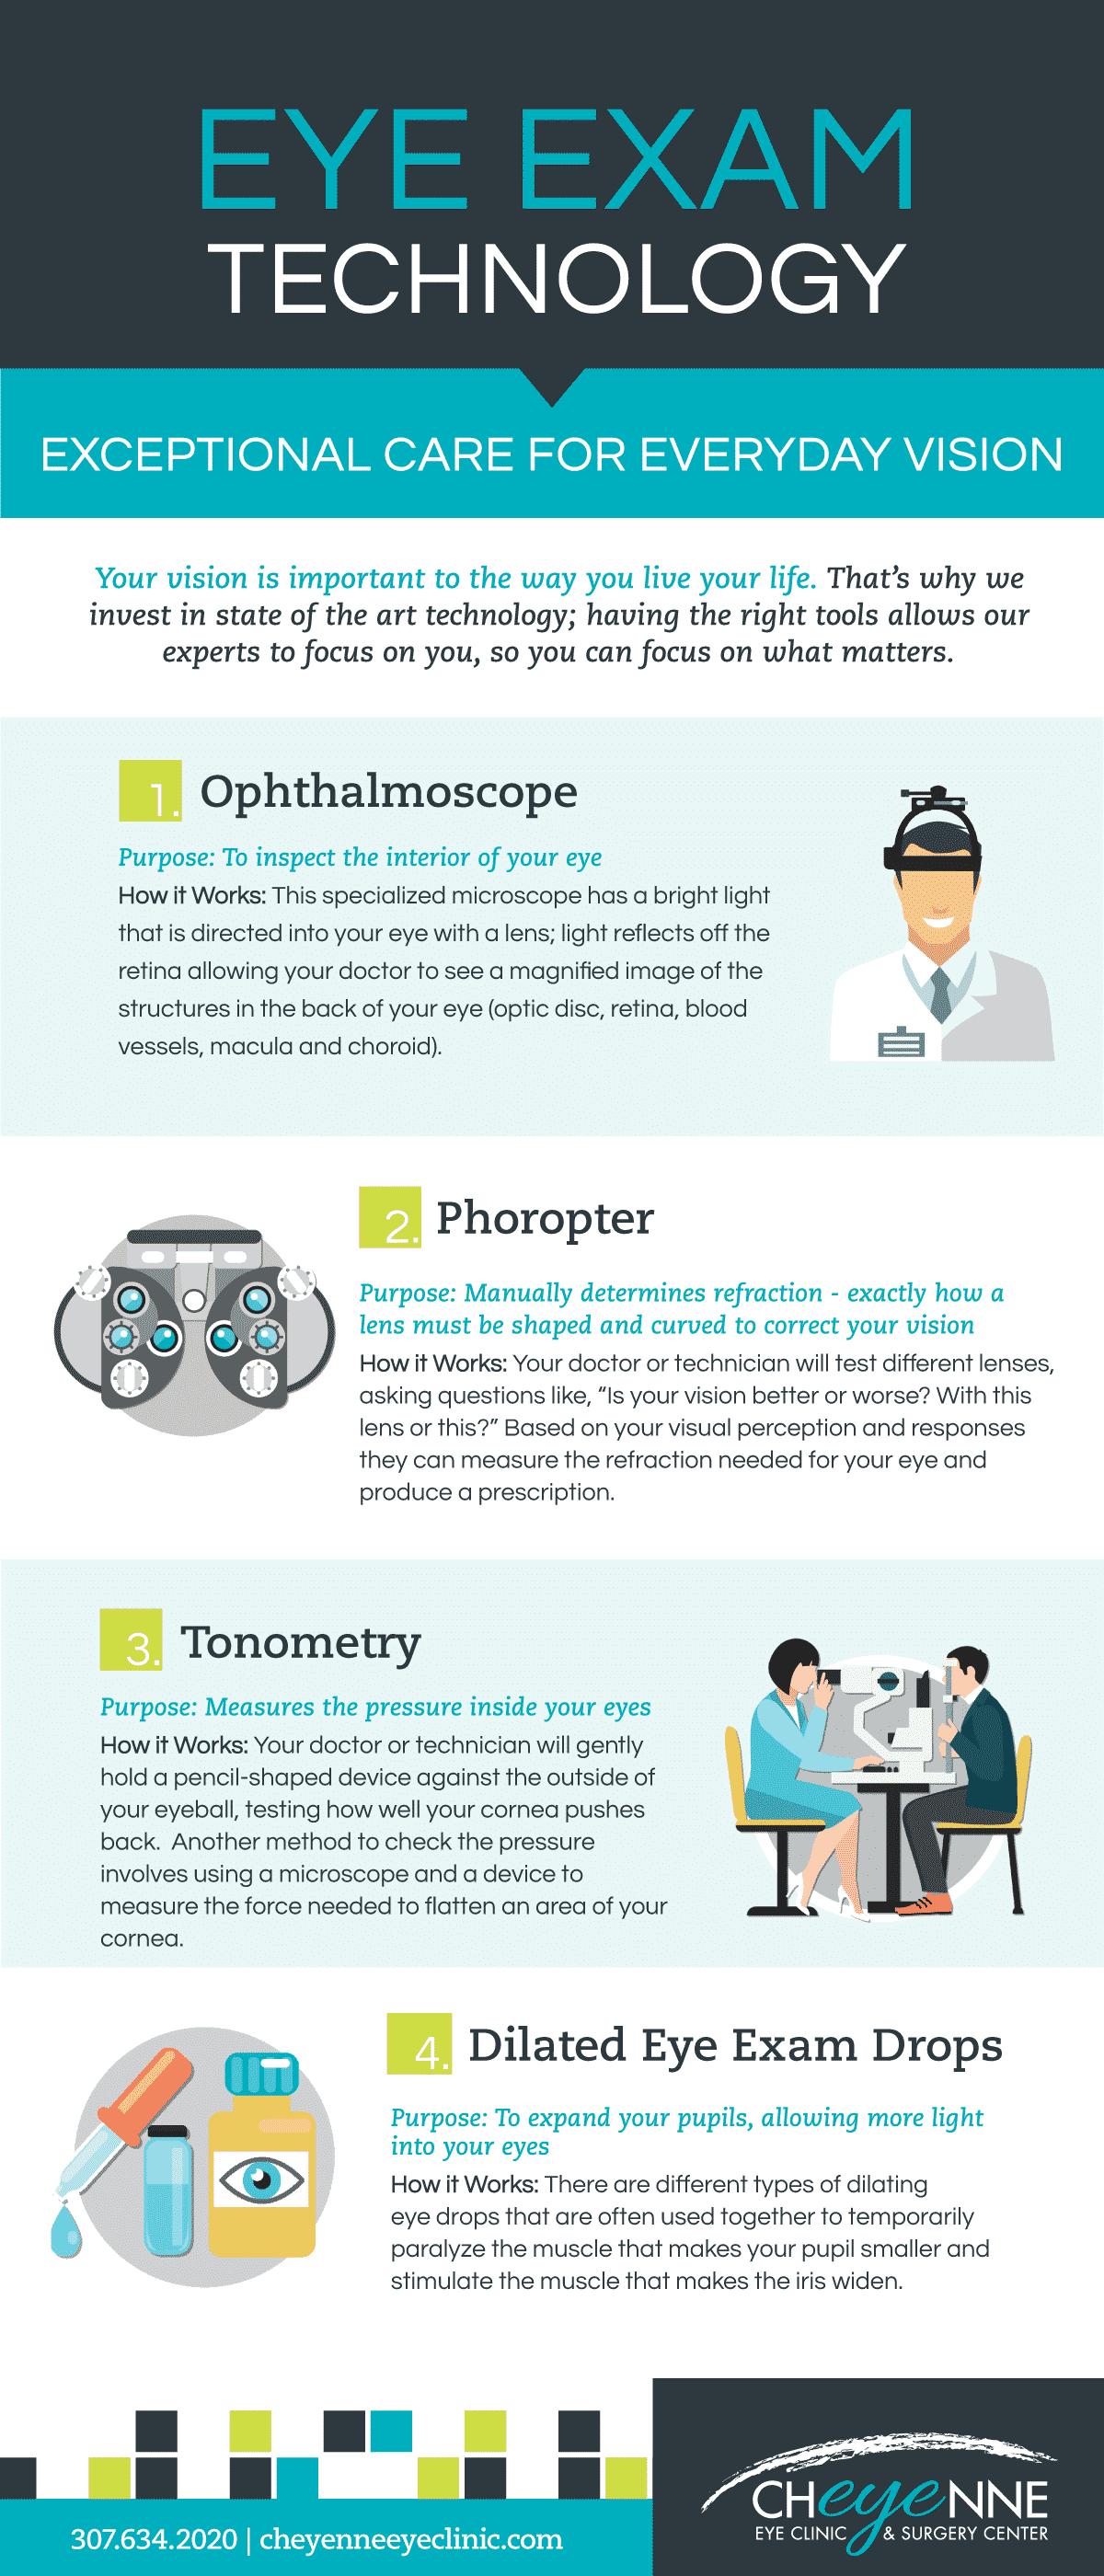 Eye Exam Technology Infographic